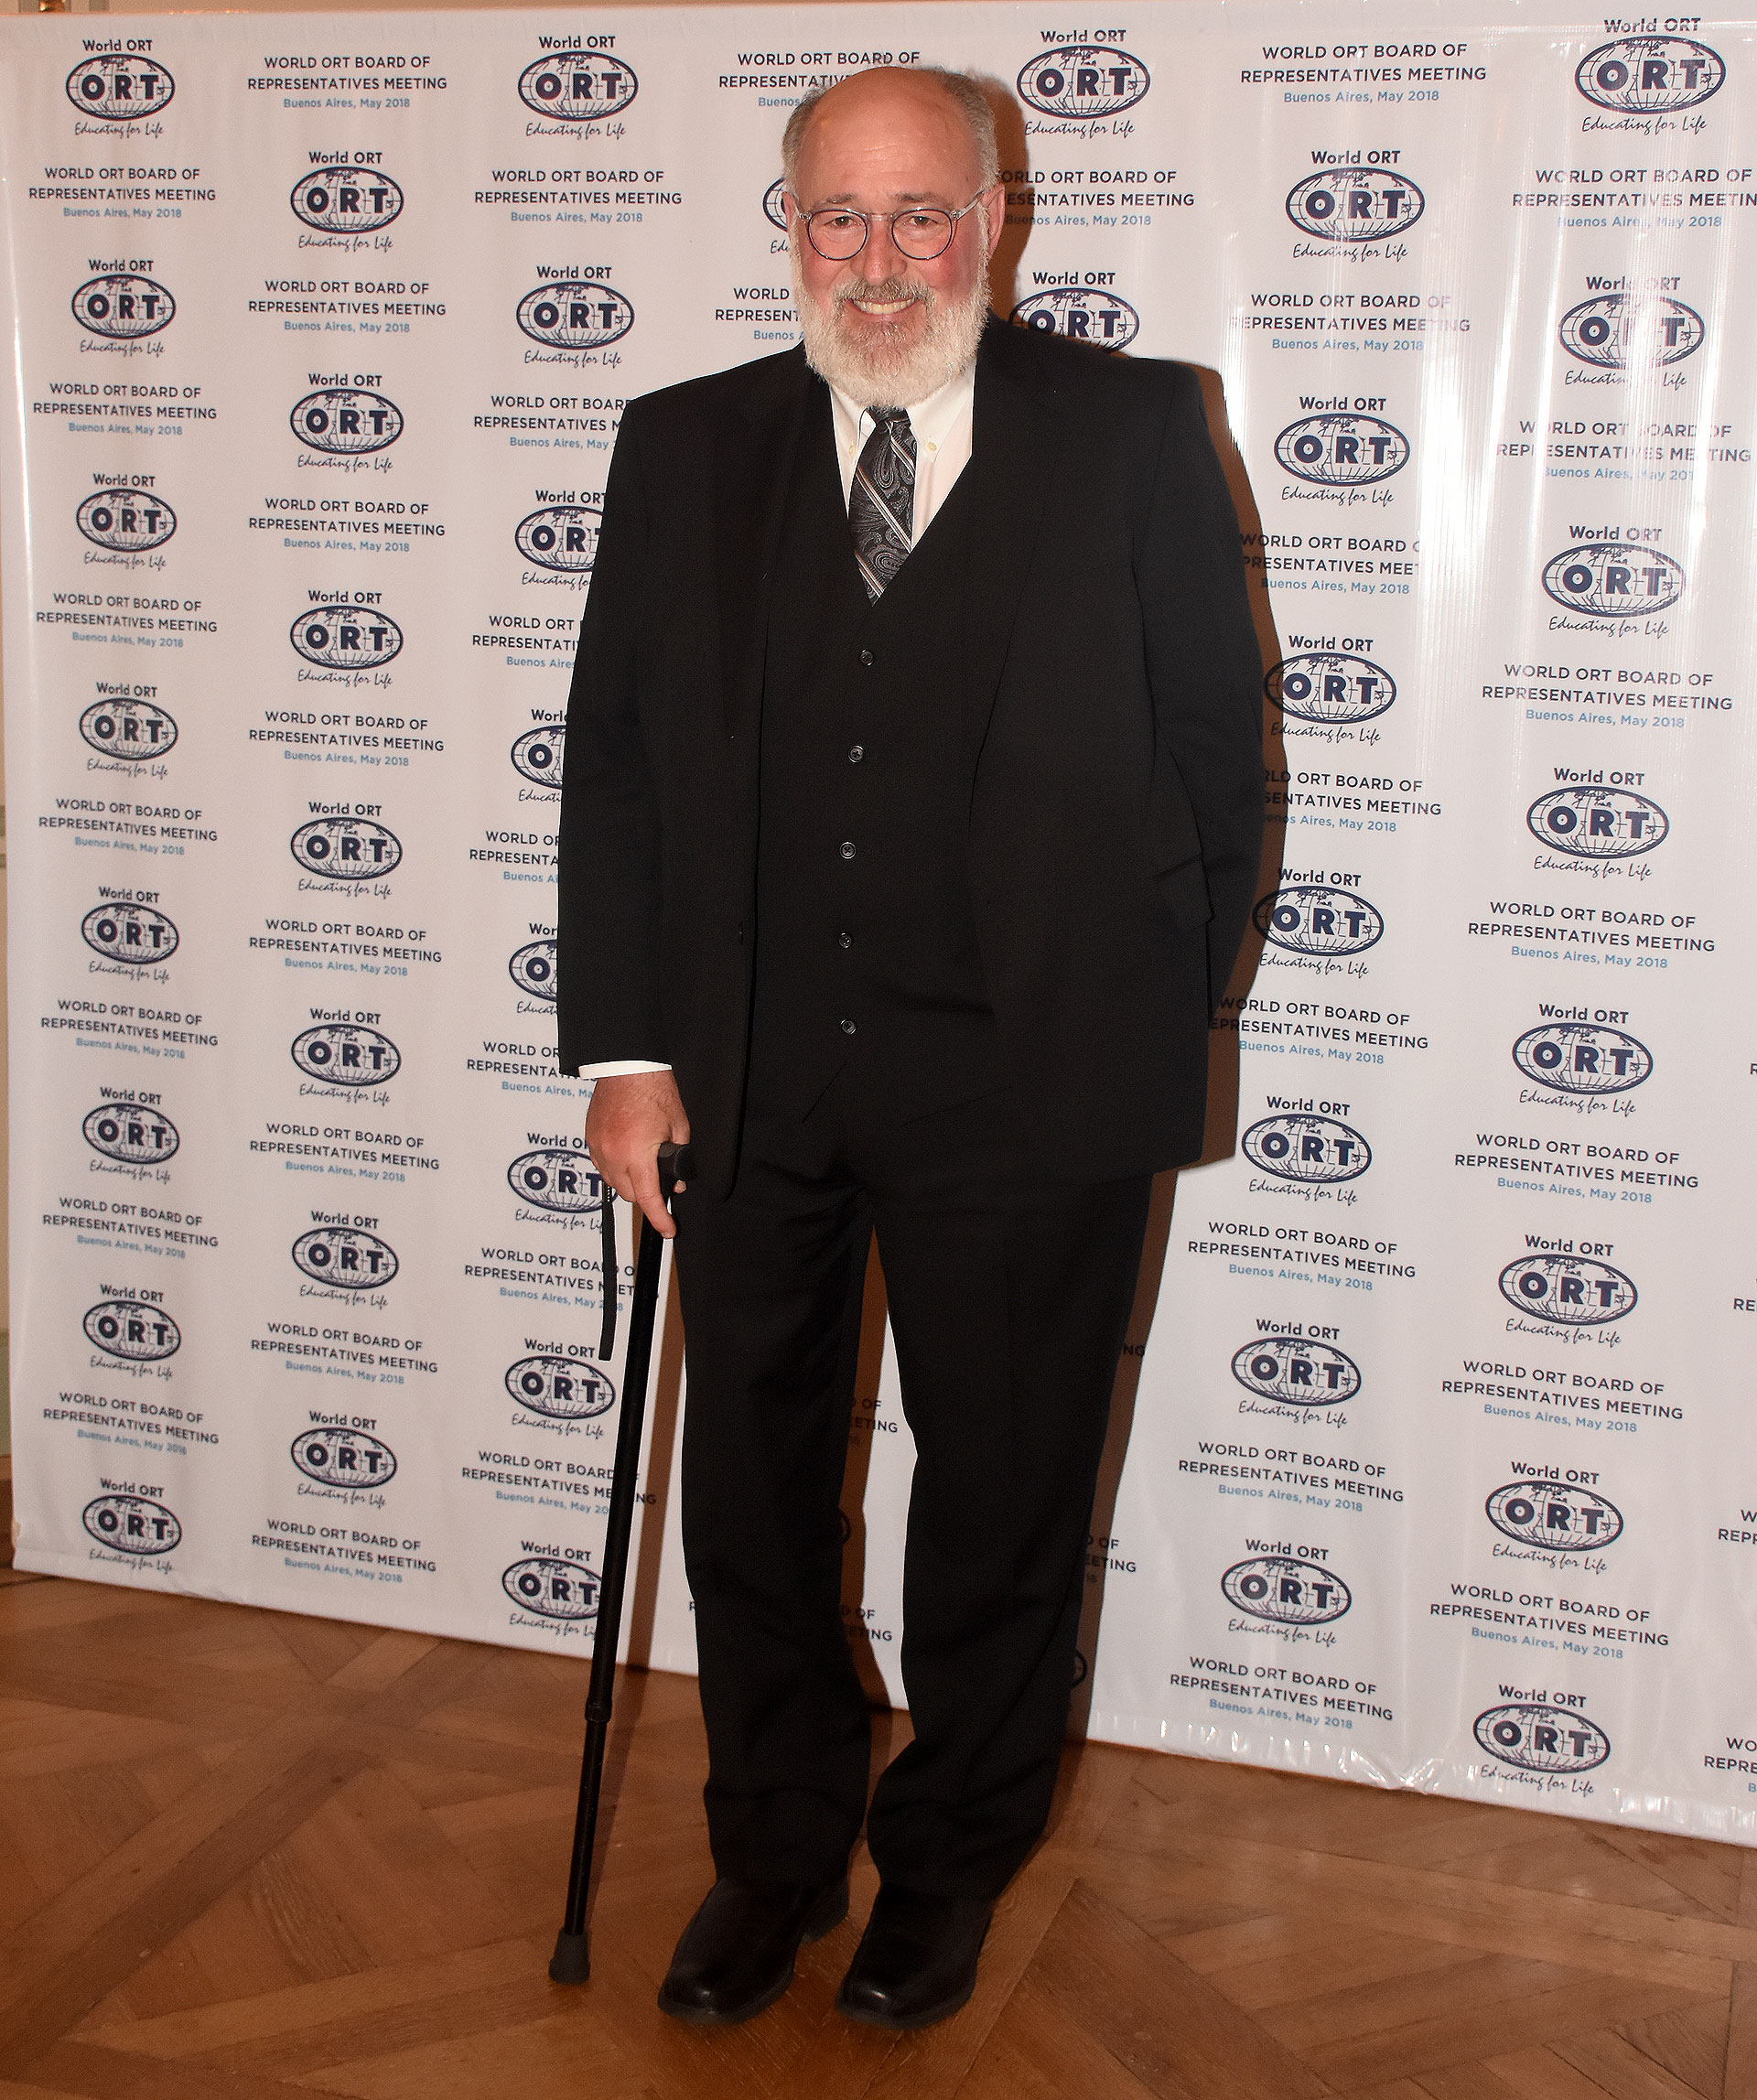 Richard Bernstein, vicepresidente de ORT Mundial